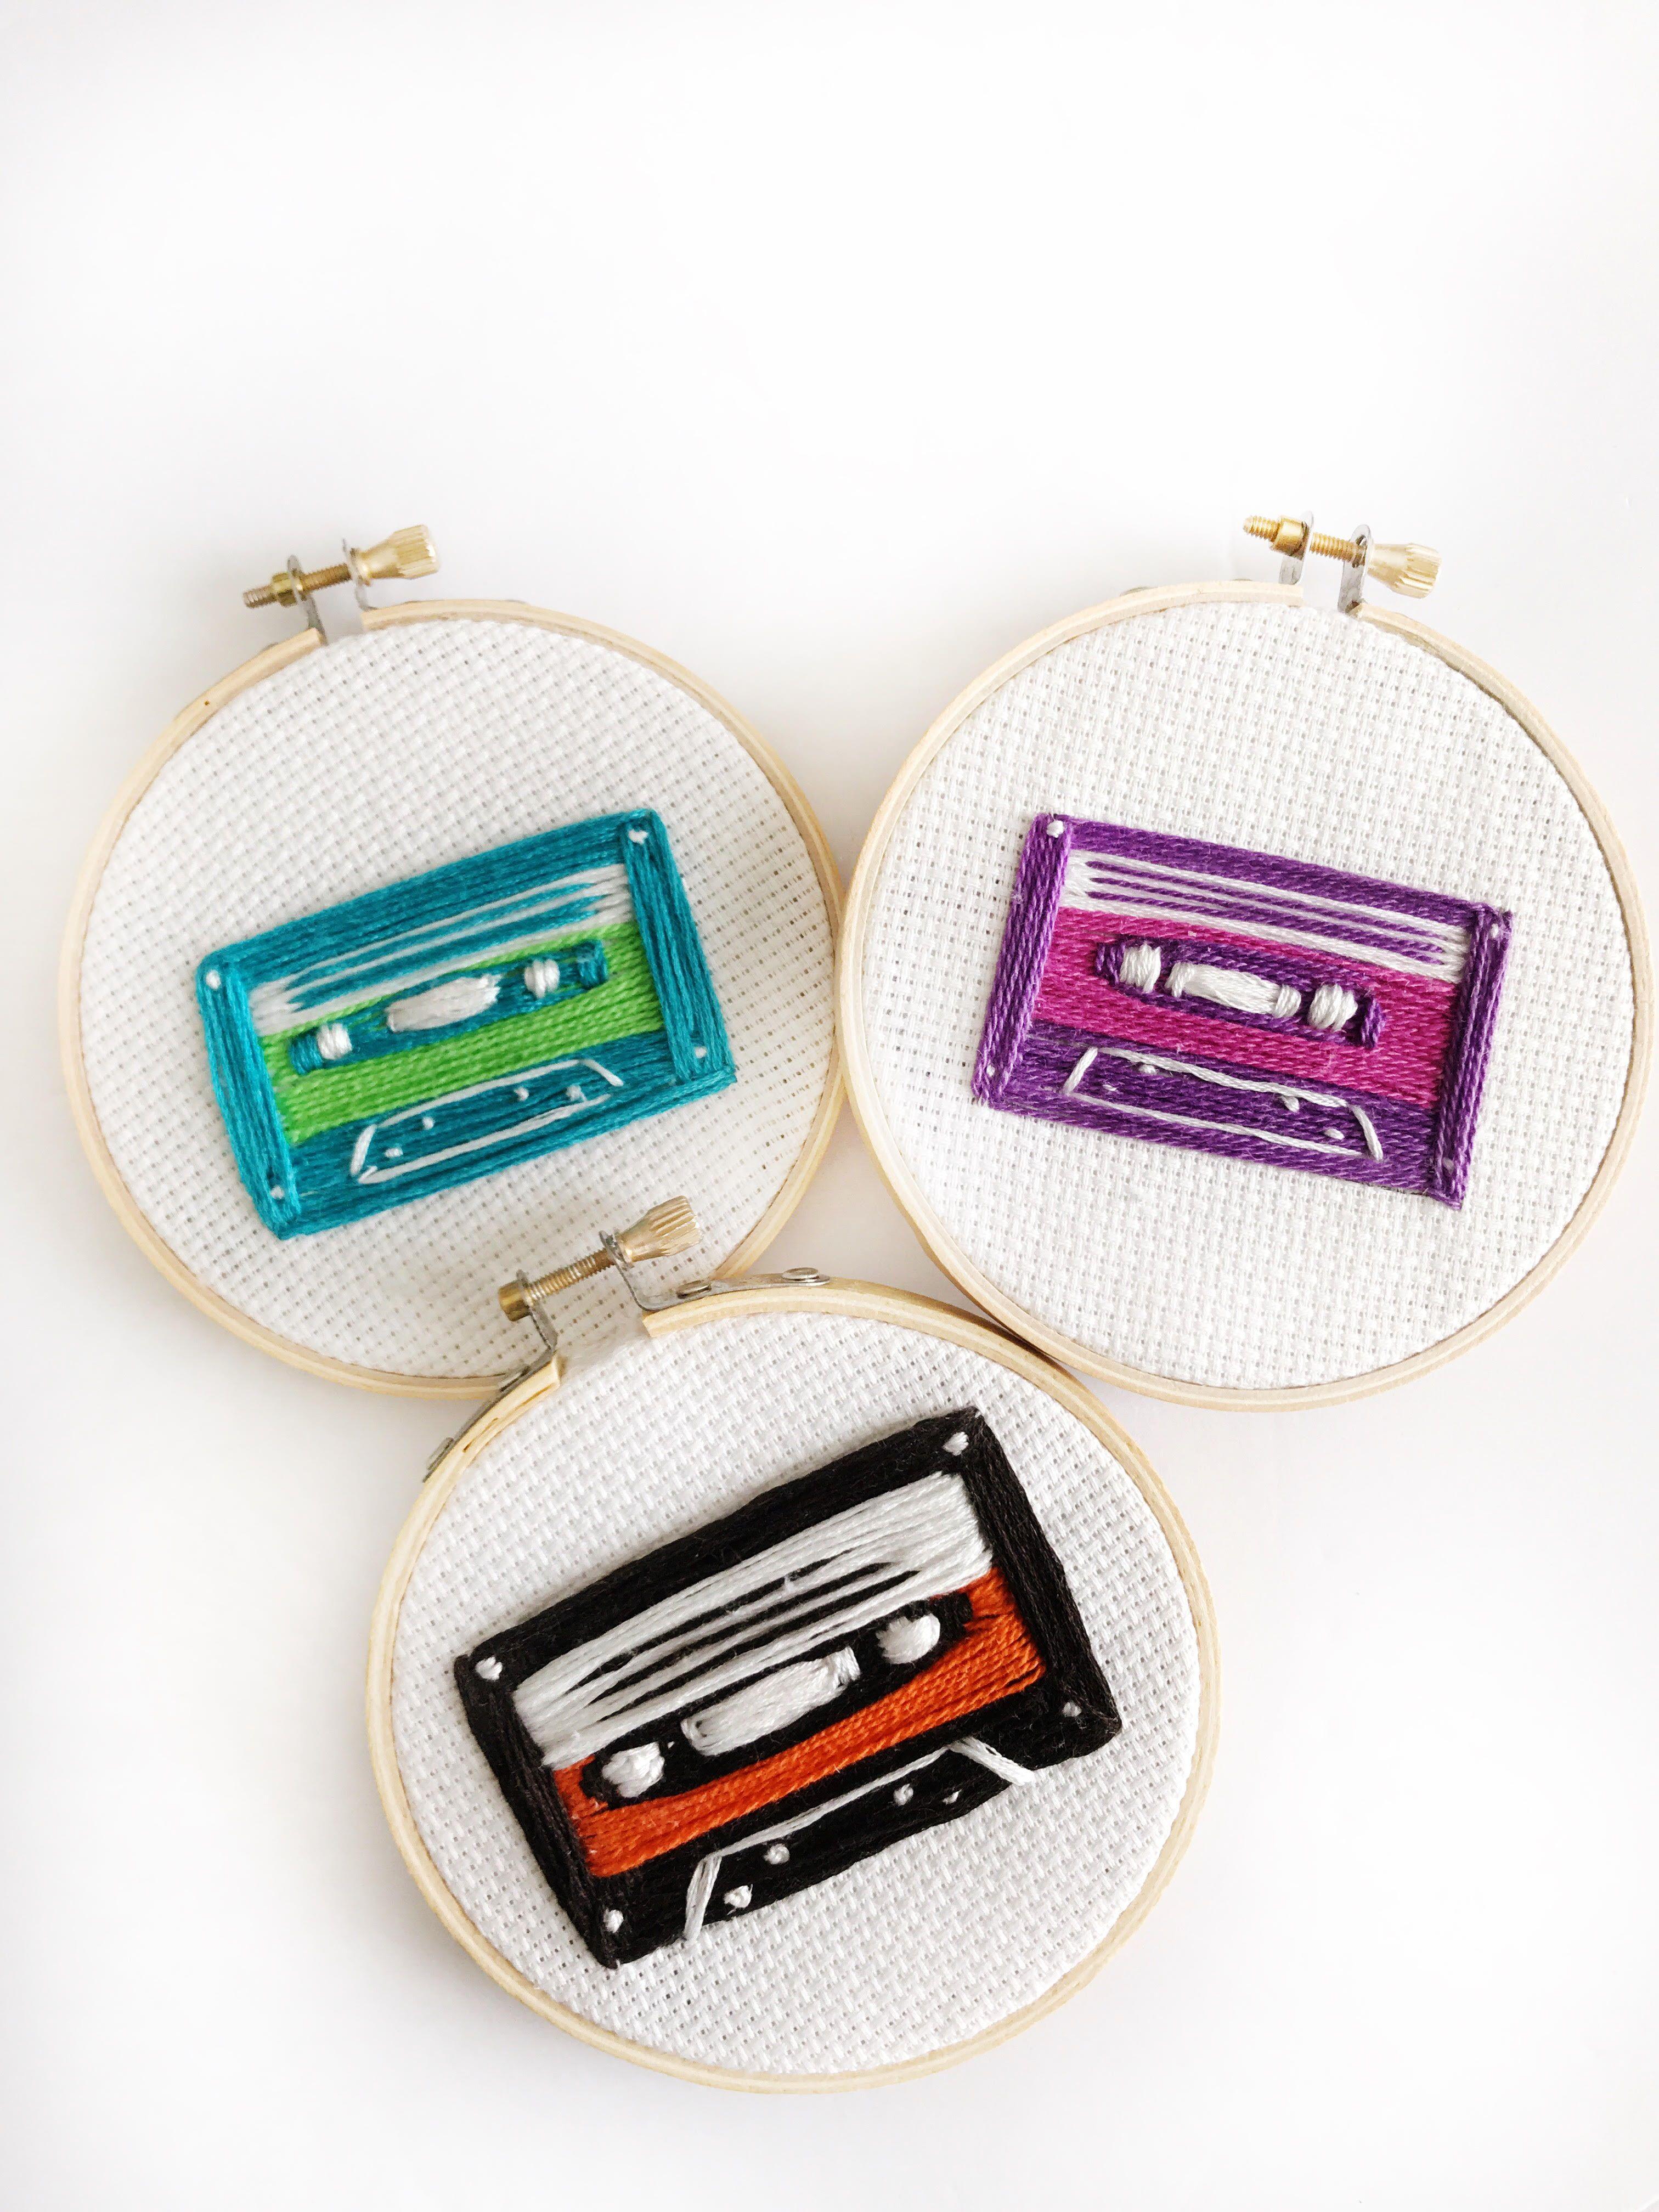 Cassette Embroidery Hoop Cassette Tape Art Tape Art Tape Wall Art